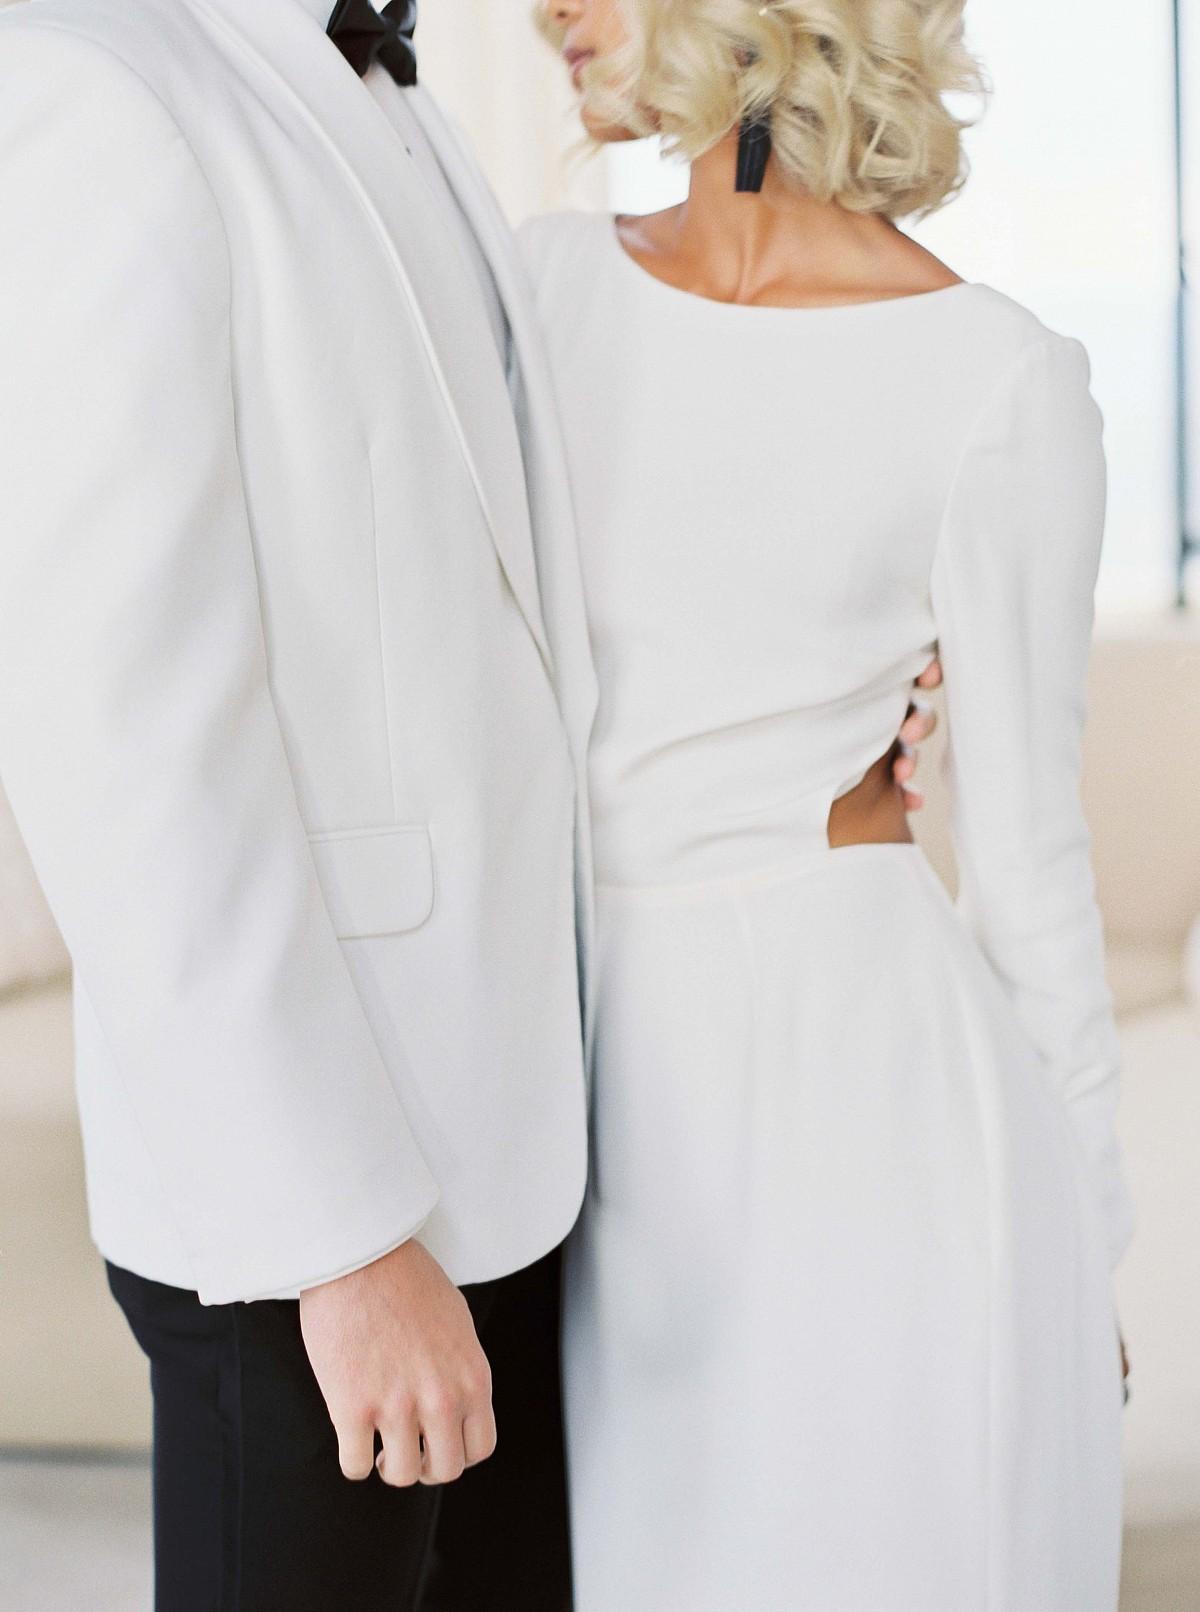 Contemporary Black Tie Wedding Inspiration at Malibu Rocky Oaks